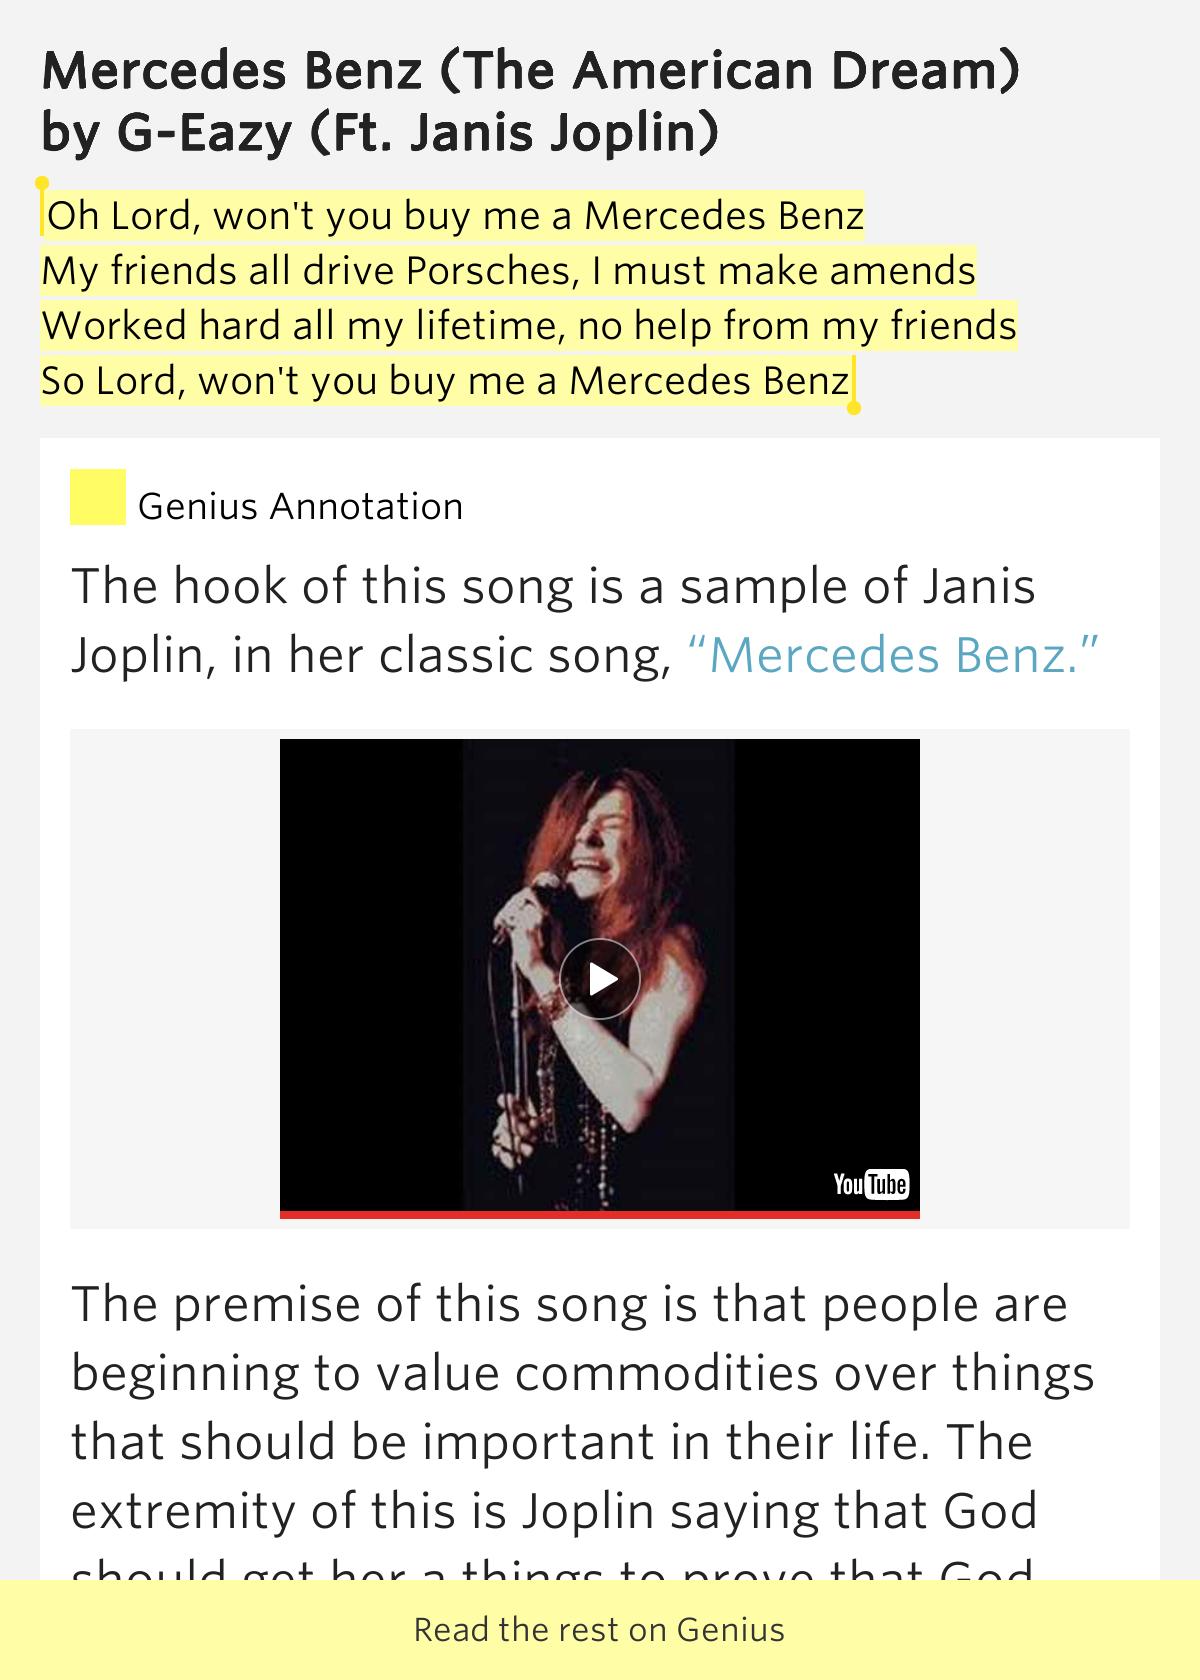 for Mercedes benz song lyrics